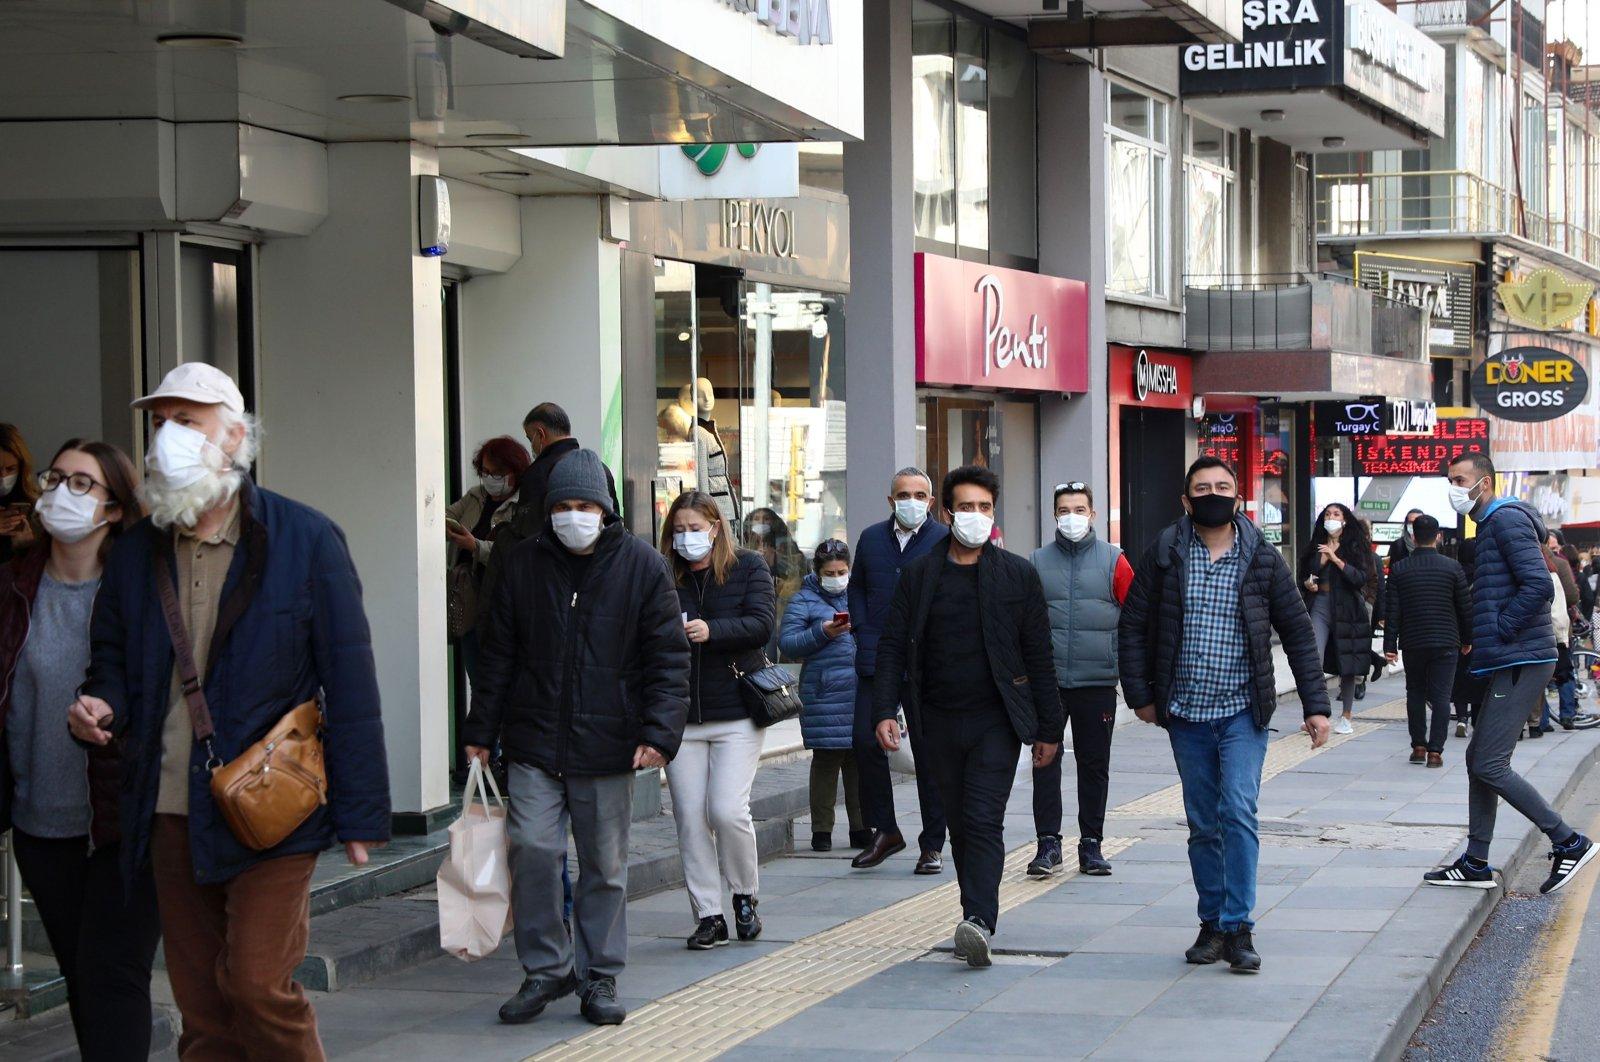 People wearing protective face masks walk on a street in the capital Ankara, Turkey, Jan. 4, 2021. (AFP Photo)